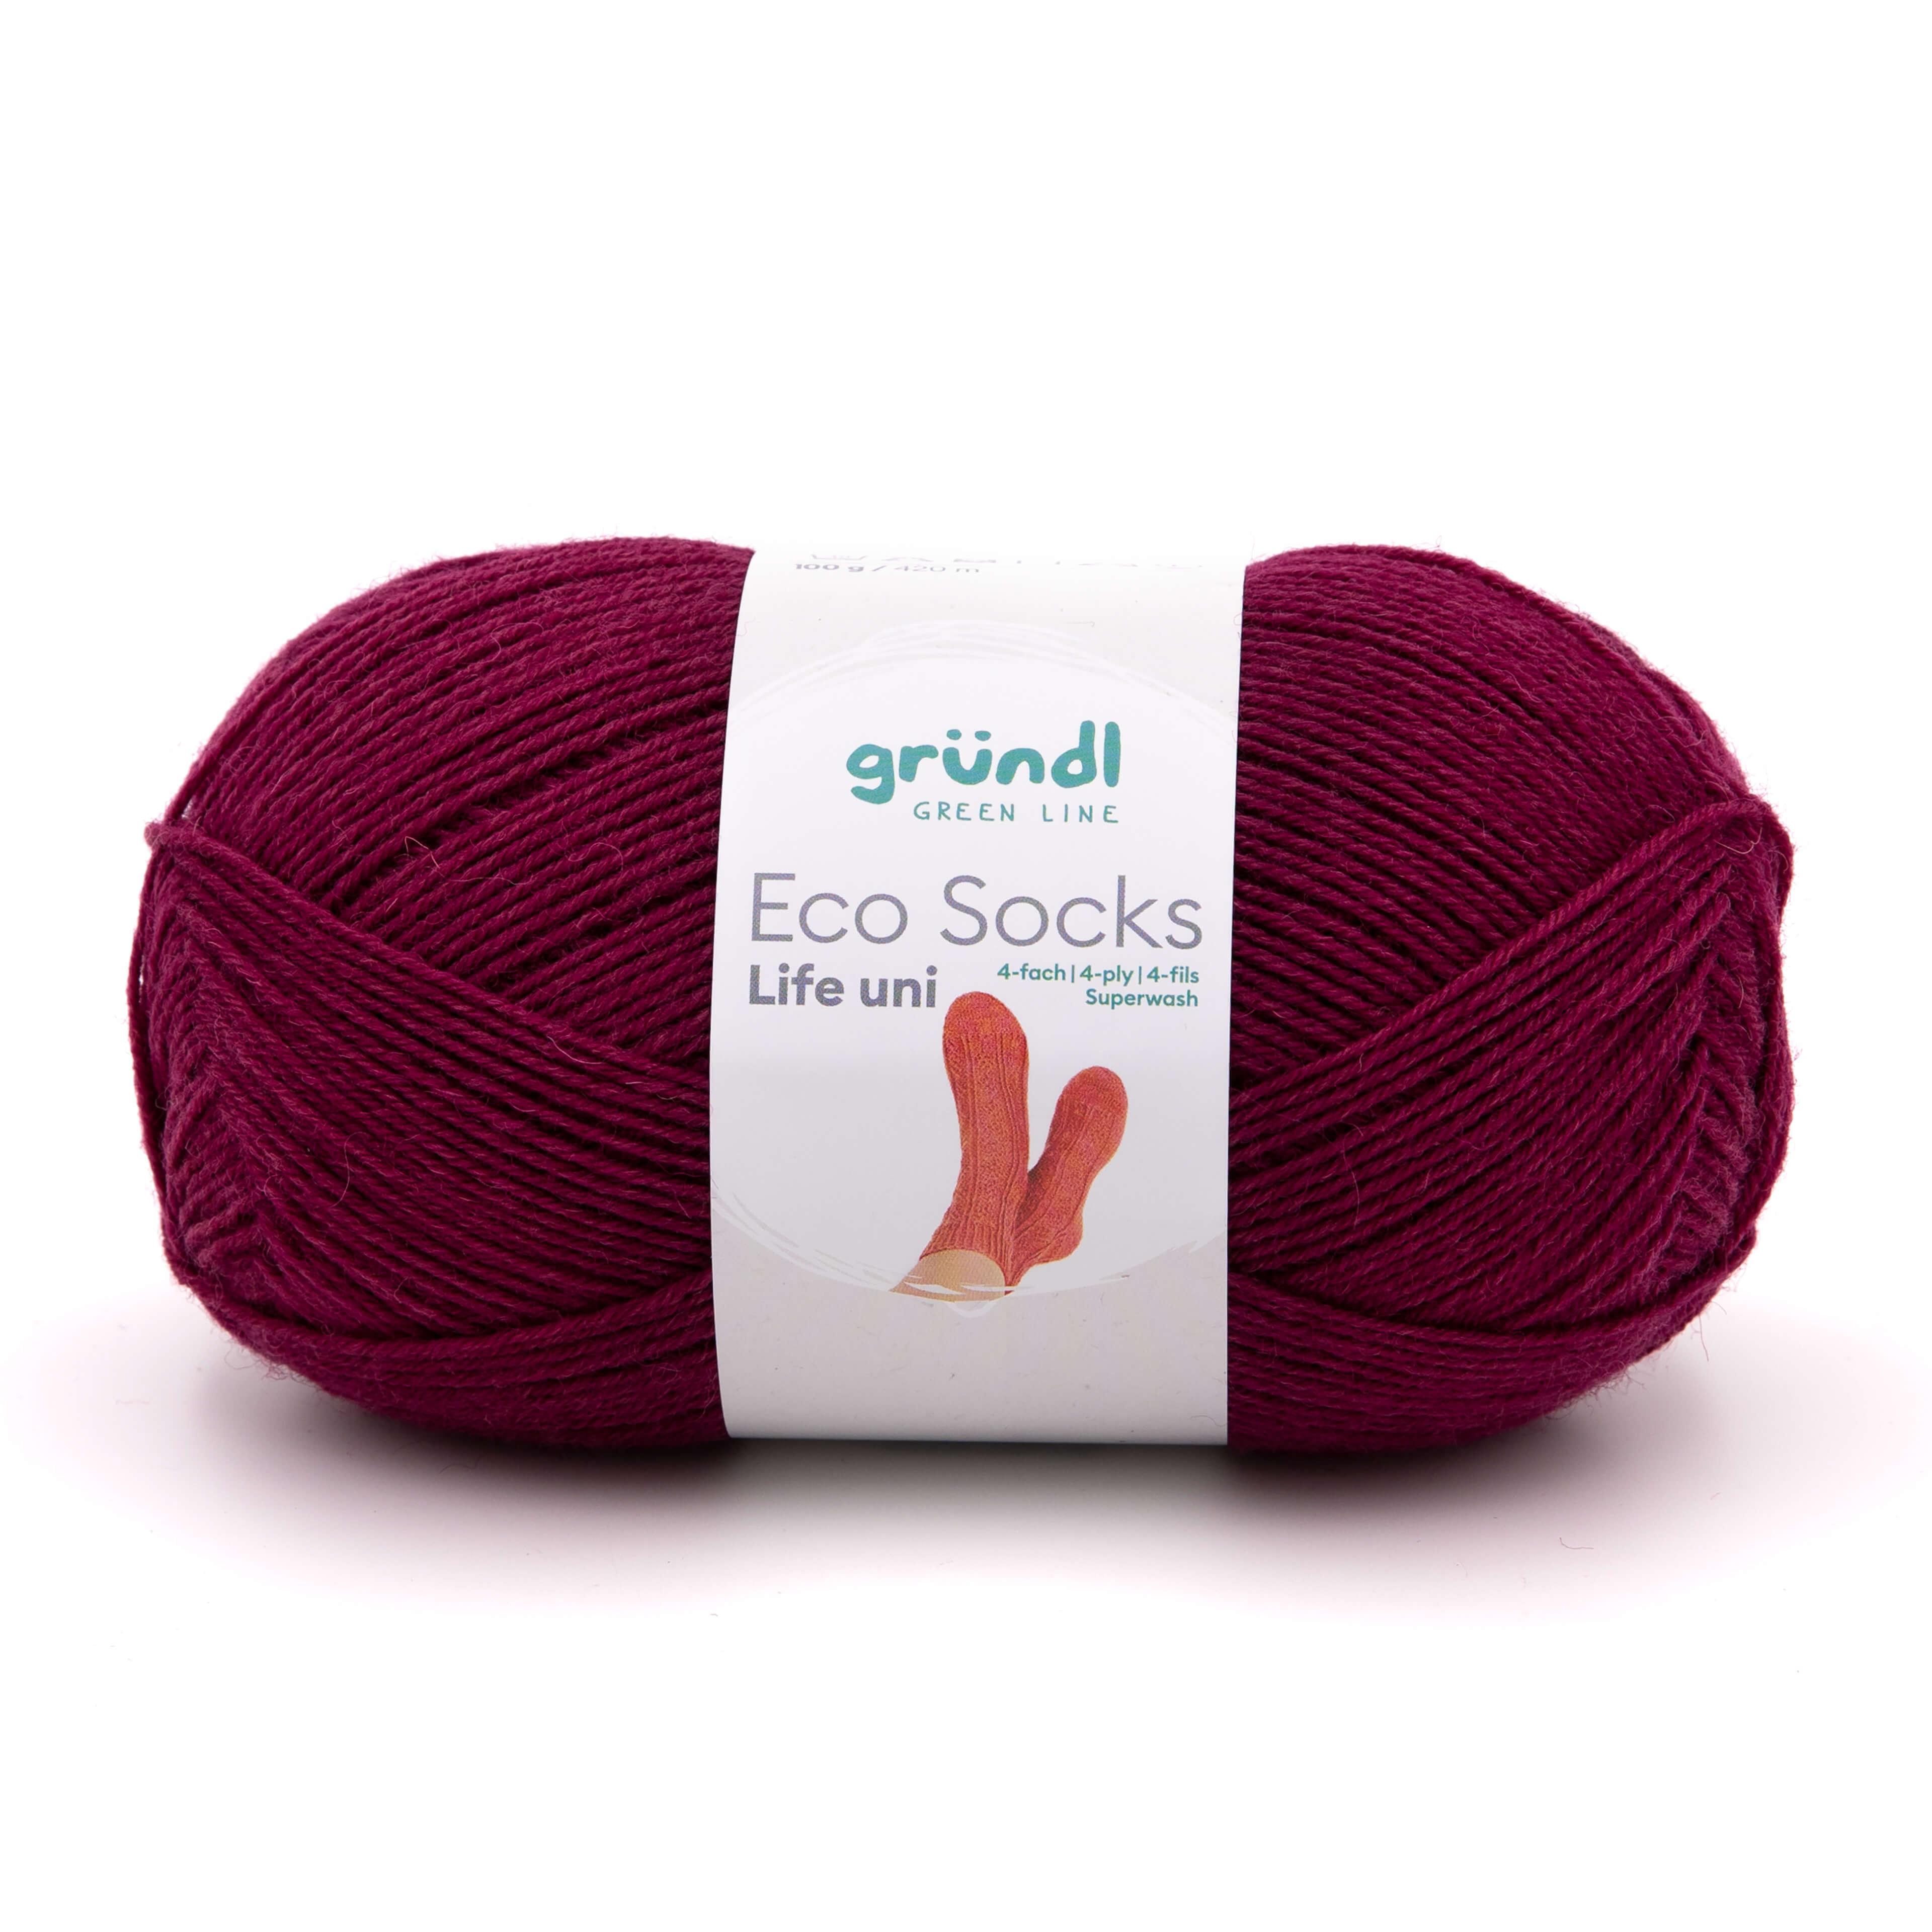 Eco Socks Life uni